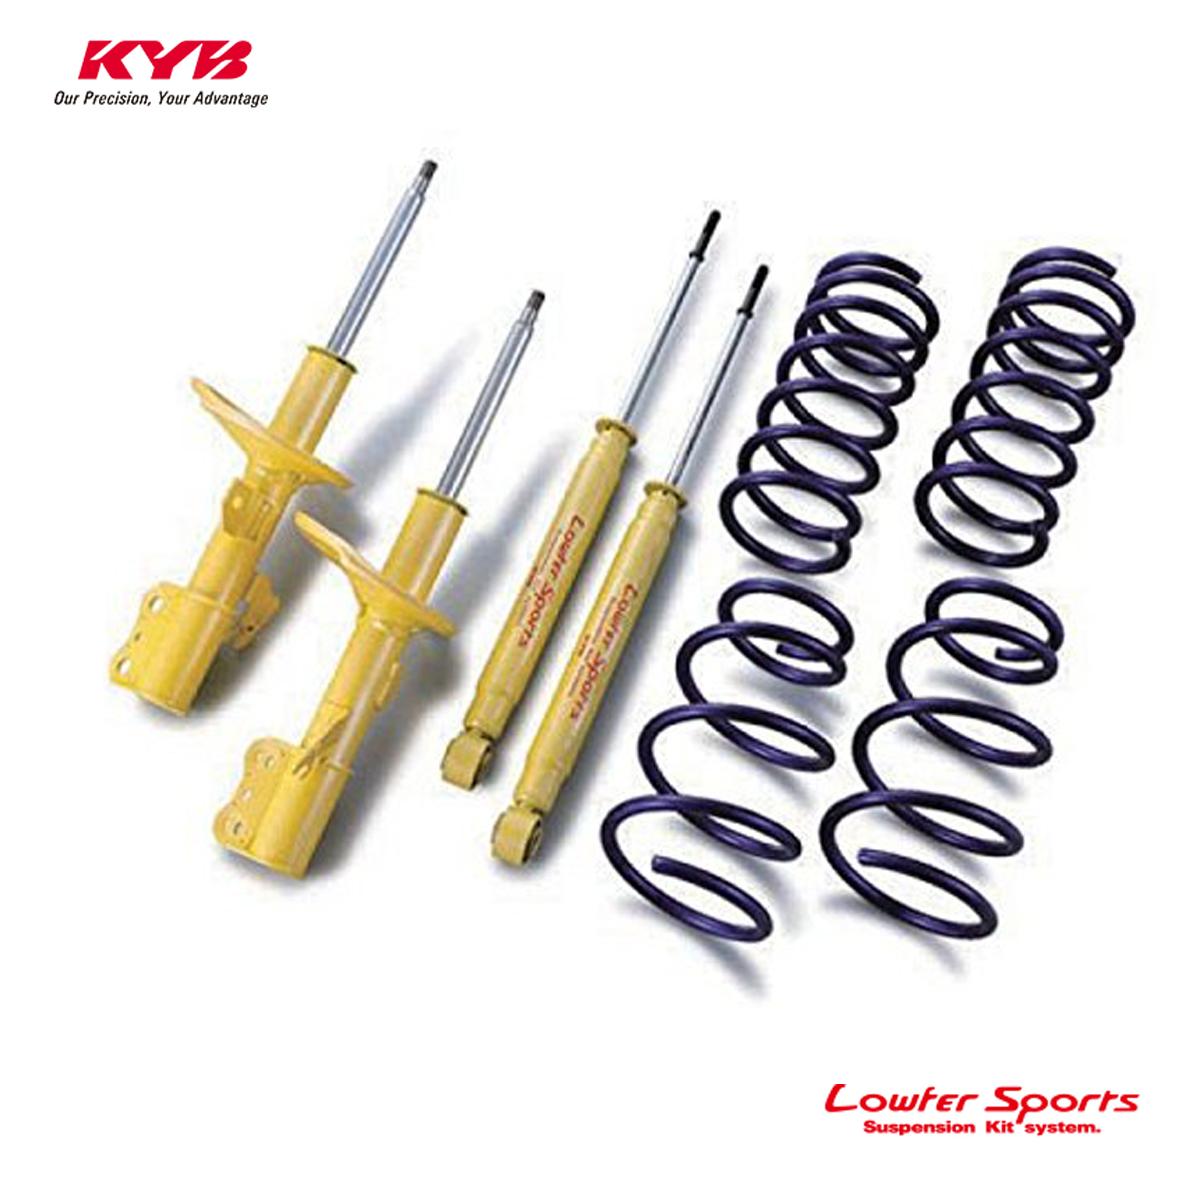 KYB カヤバ ムーヴ L152S ショックアブソーバー サスペンションキット Lowfer Sports LKIT-L152S 配送先条件有り